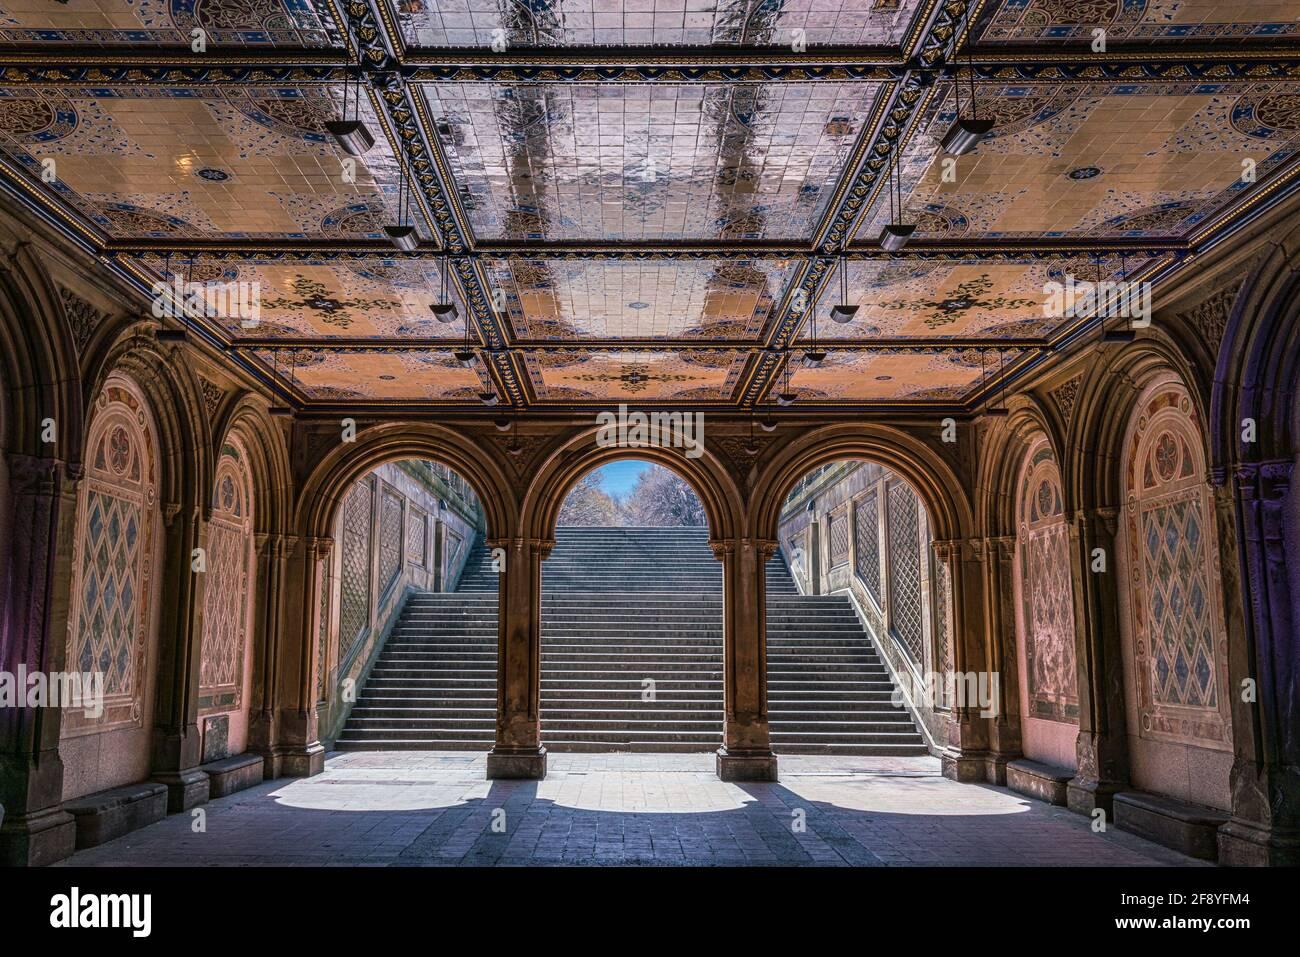 Bethesda Terrace, Central Park, New York City Foto Stock